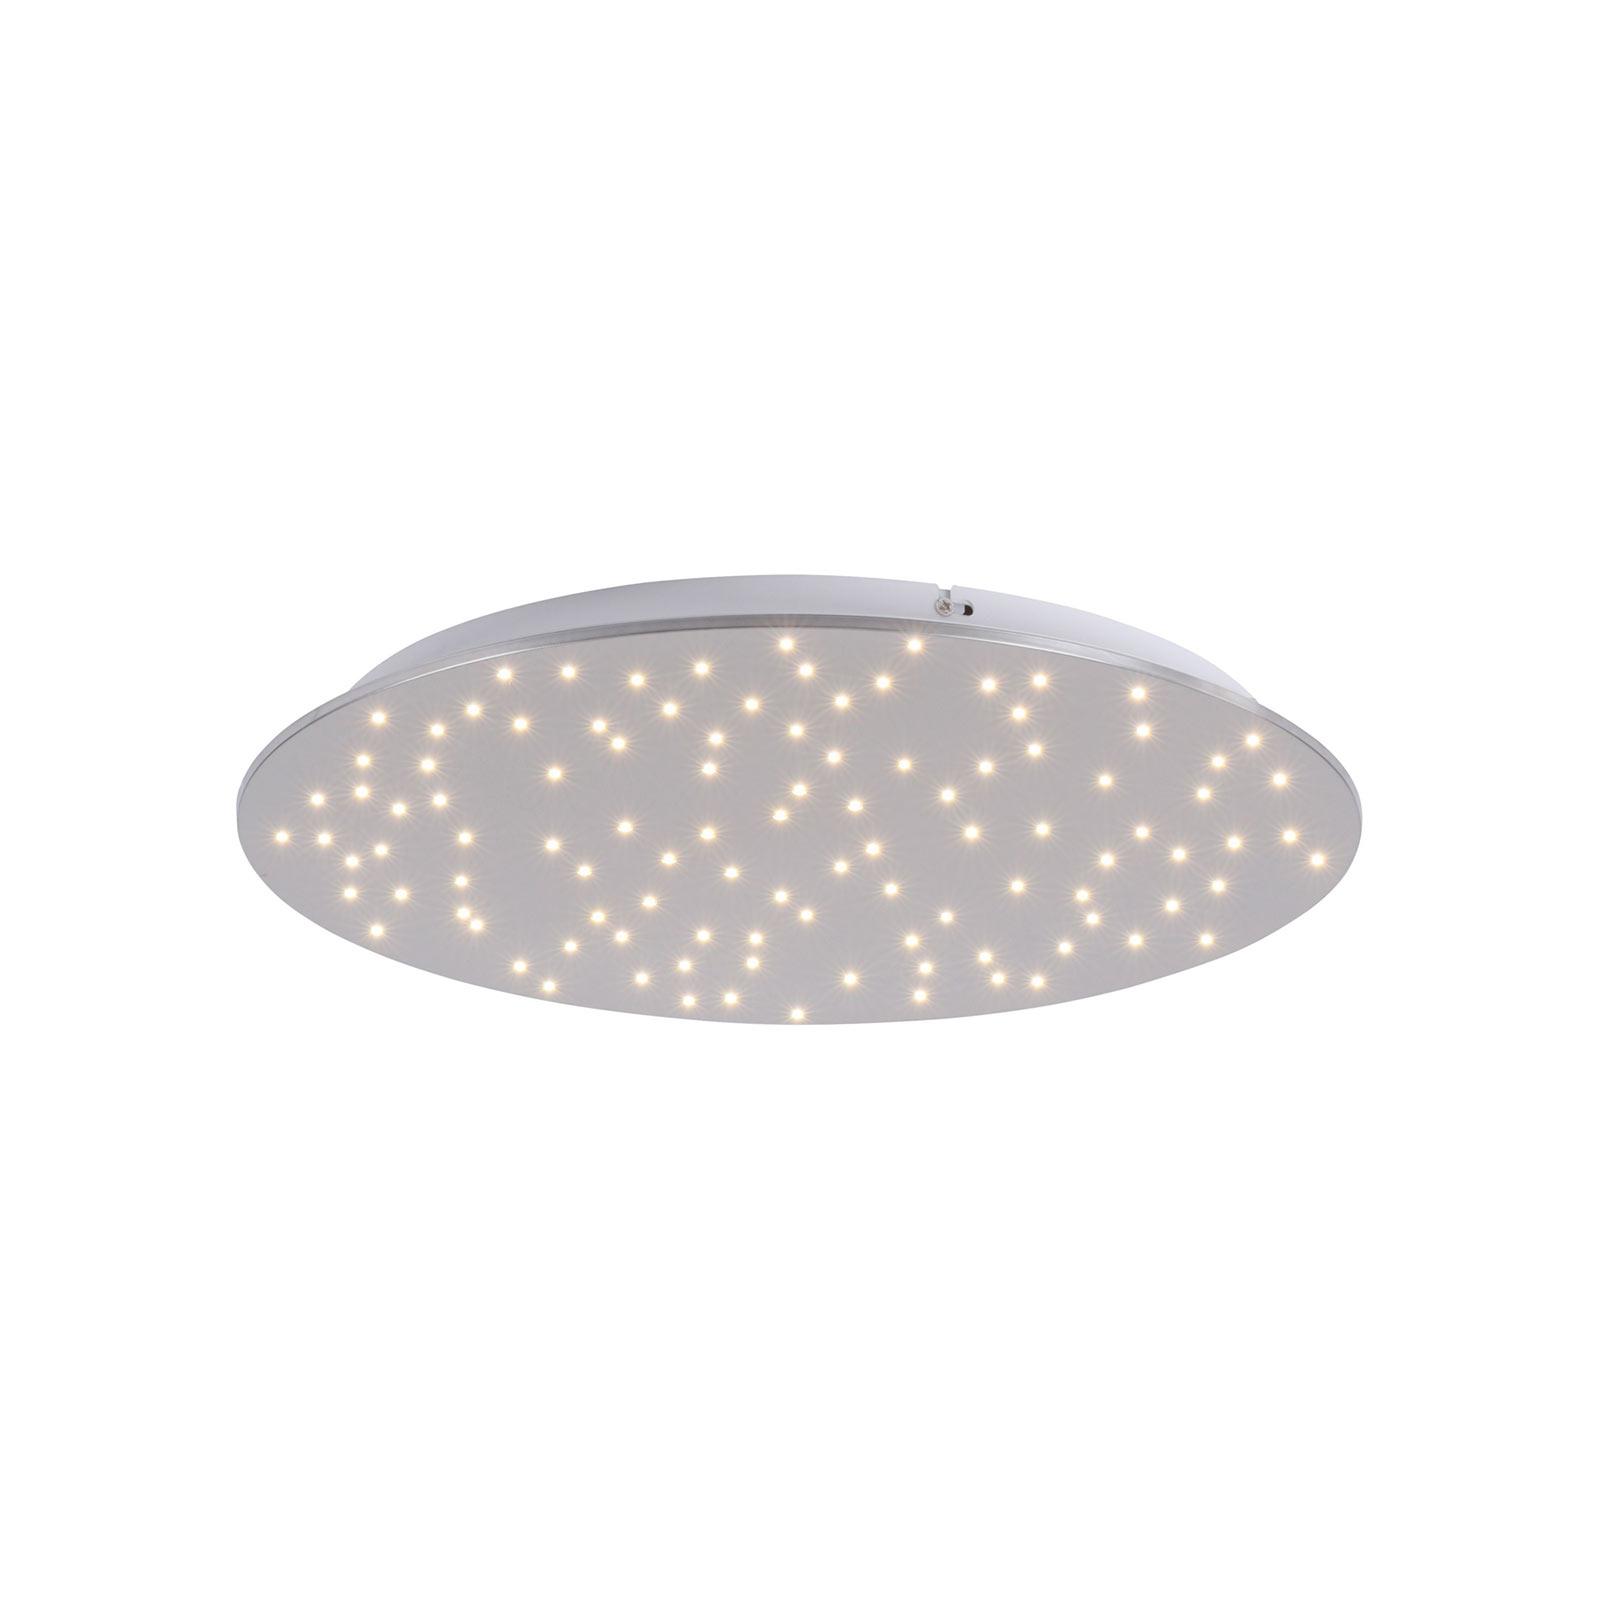 Sparkle LED-taklampe, tunable white, Ø 48 cm